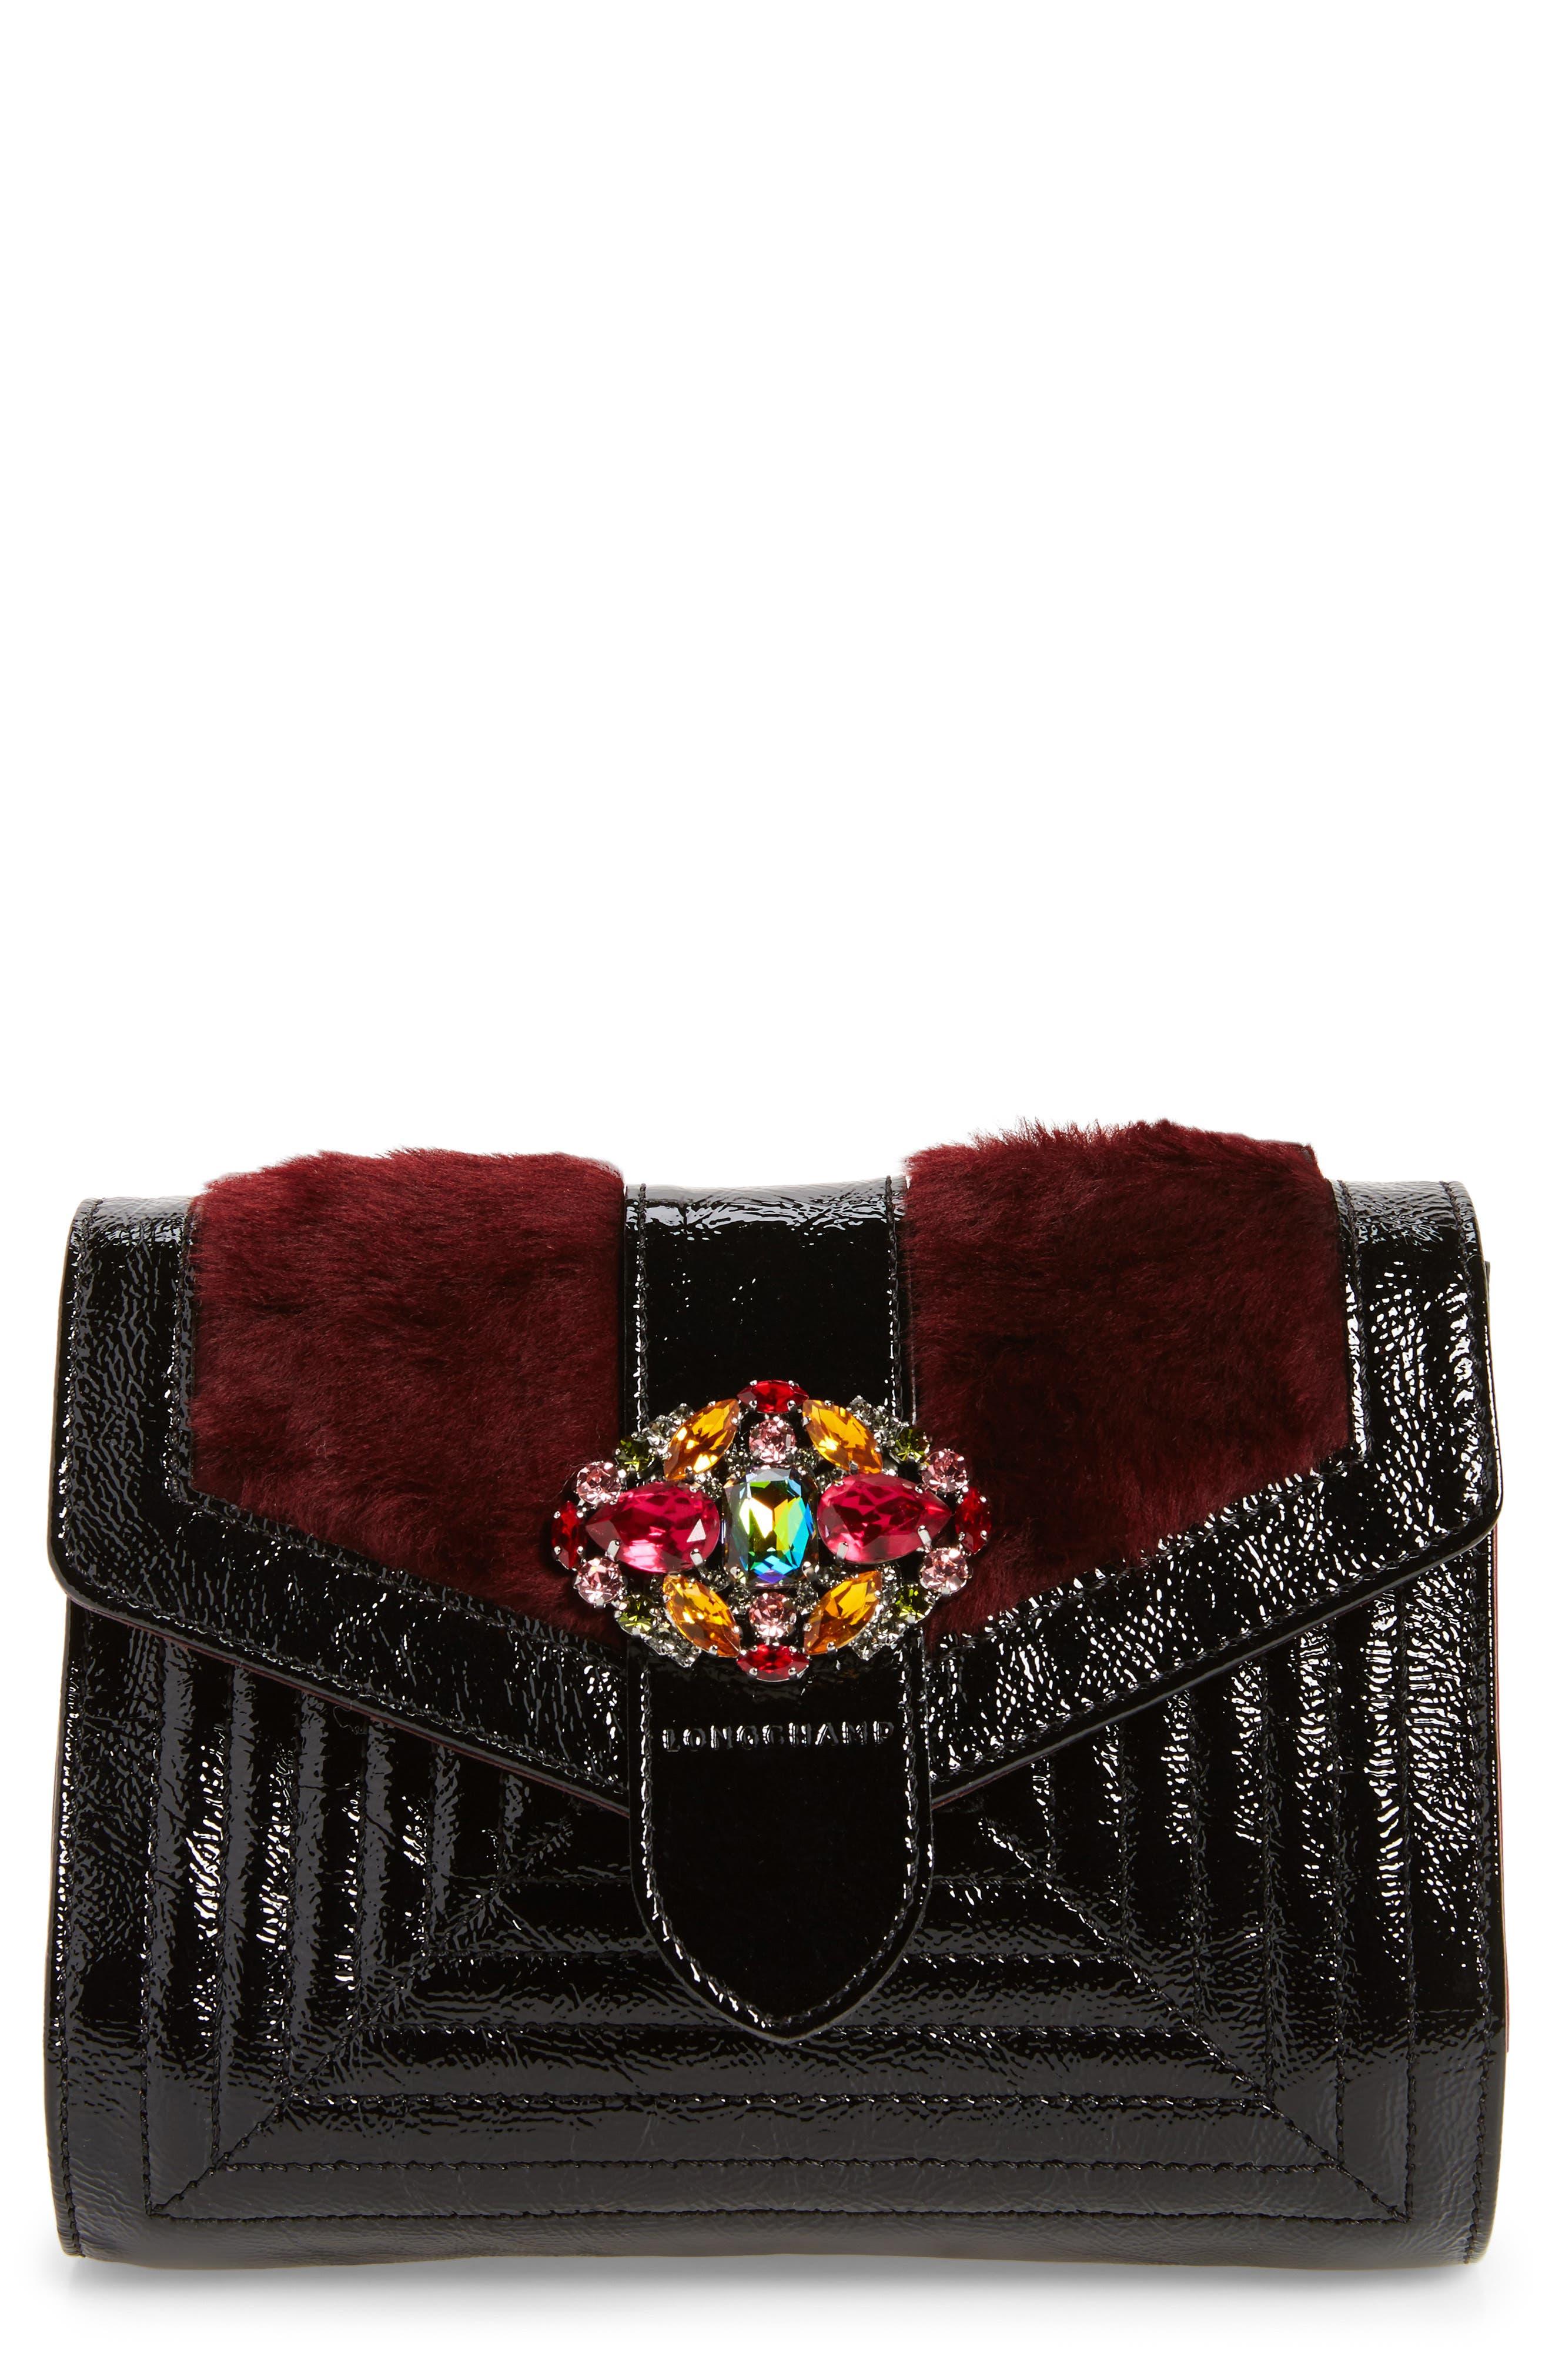 La Baronne Genuine Shearling Trim Leather Clutch,                         Main,                         color, Red Lacquer